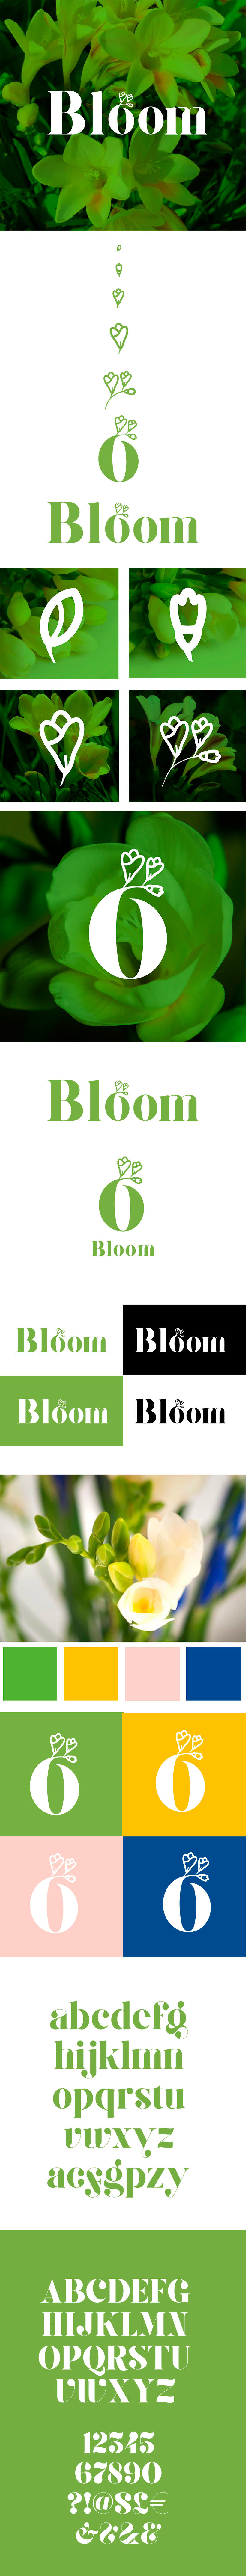 Bloom, perfume -1